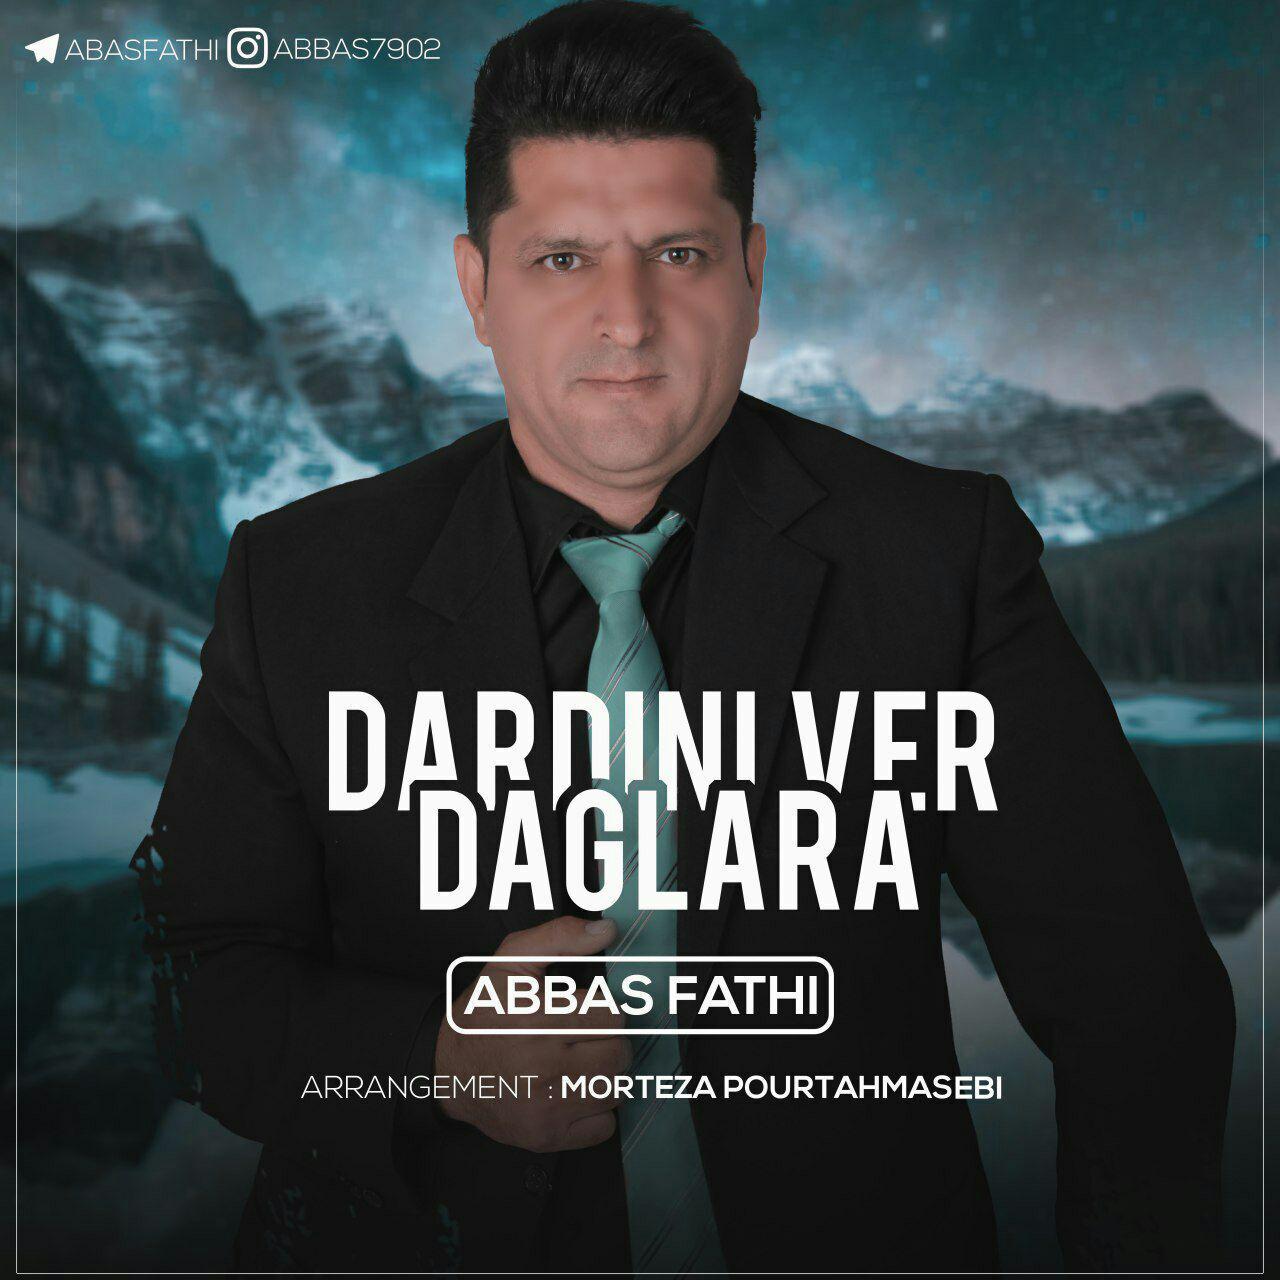 http://s9.picofile.com/file/8366267118/06Abbas_Fathi_Dardini_Ver_Daglara.jpg